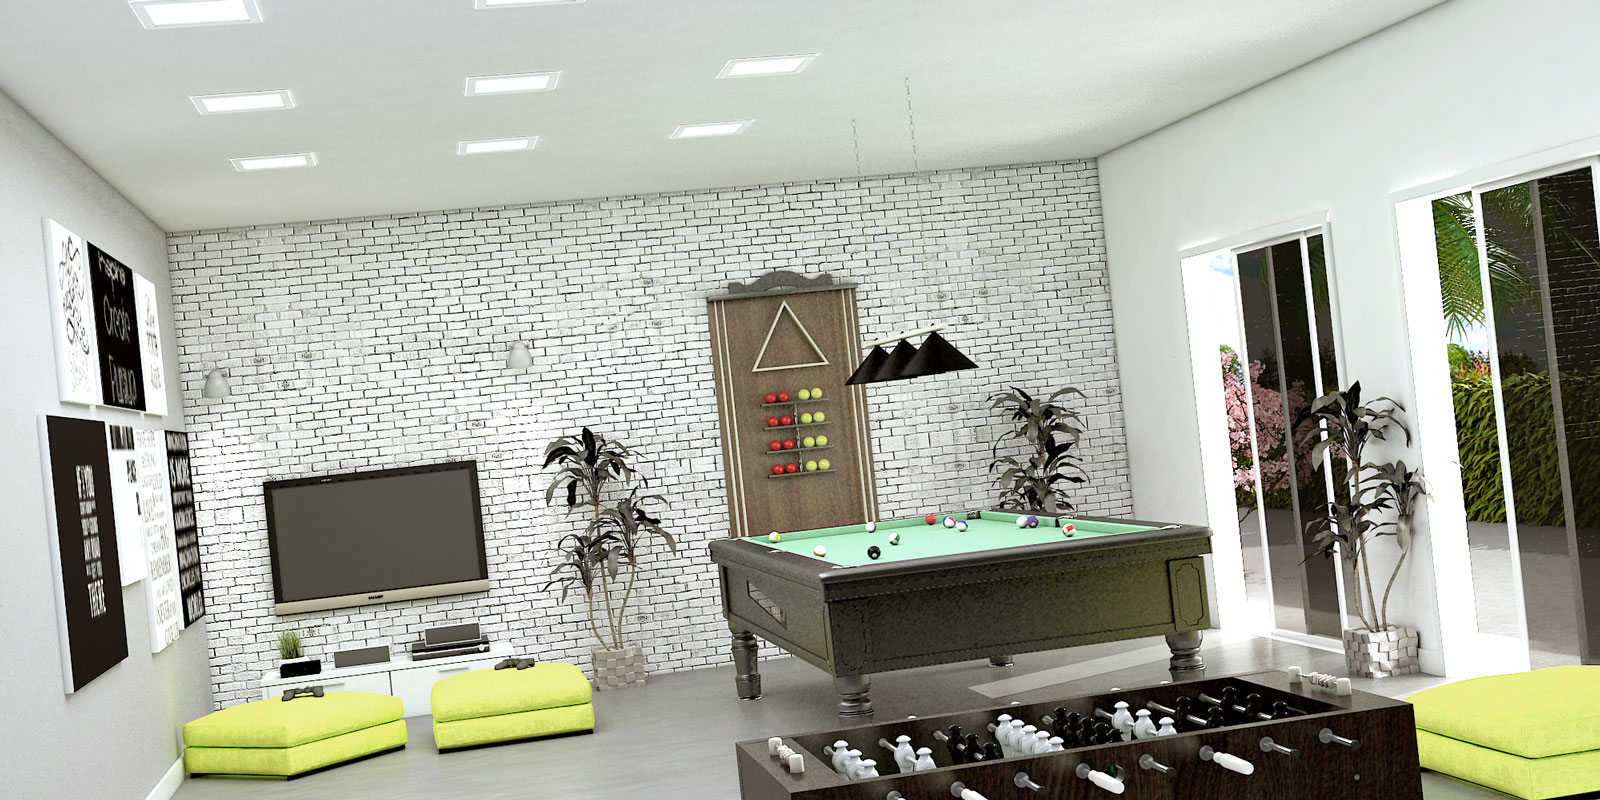 Perspectiva-Ilustrativa-Salao-de-Jogos-Royal-Garden-Marica-RJ